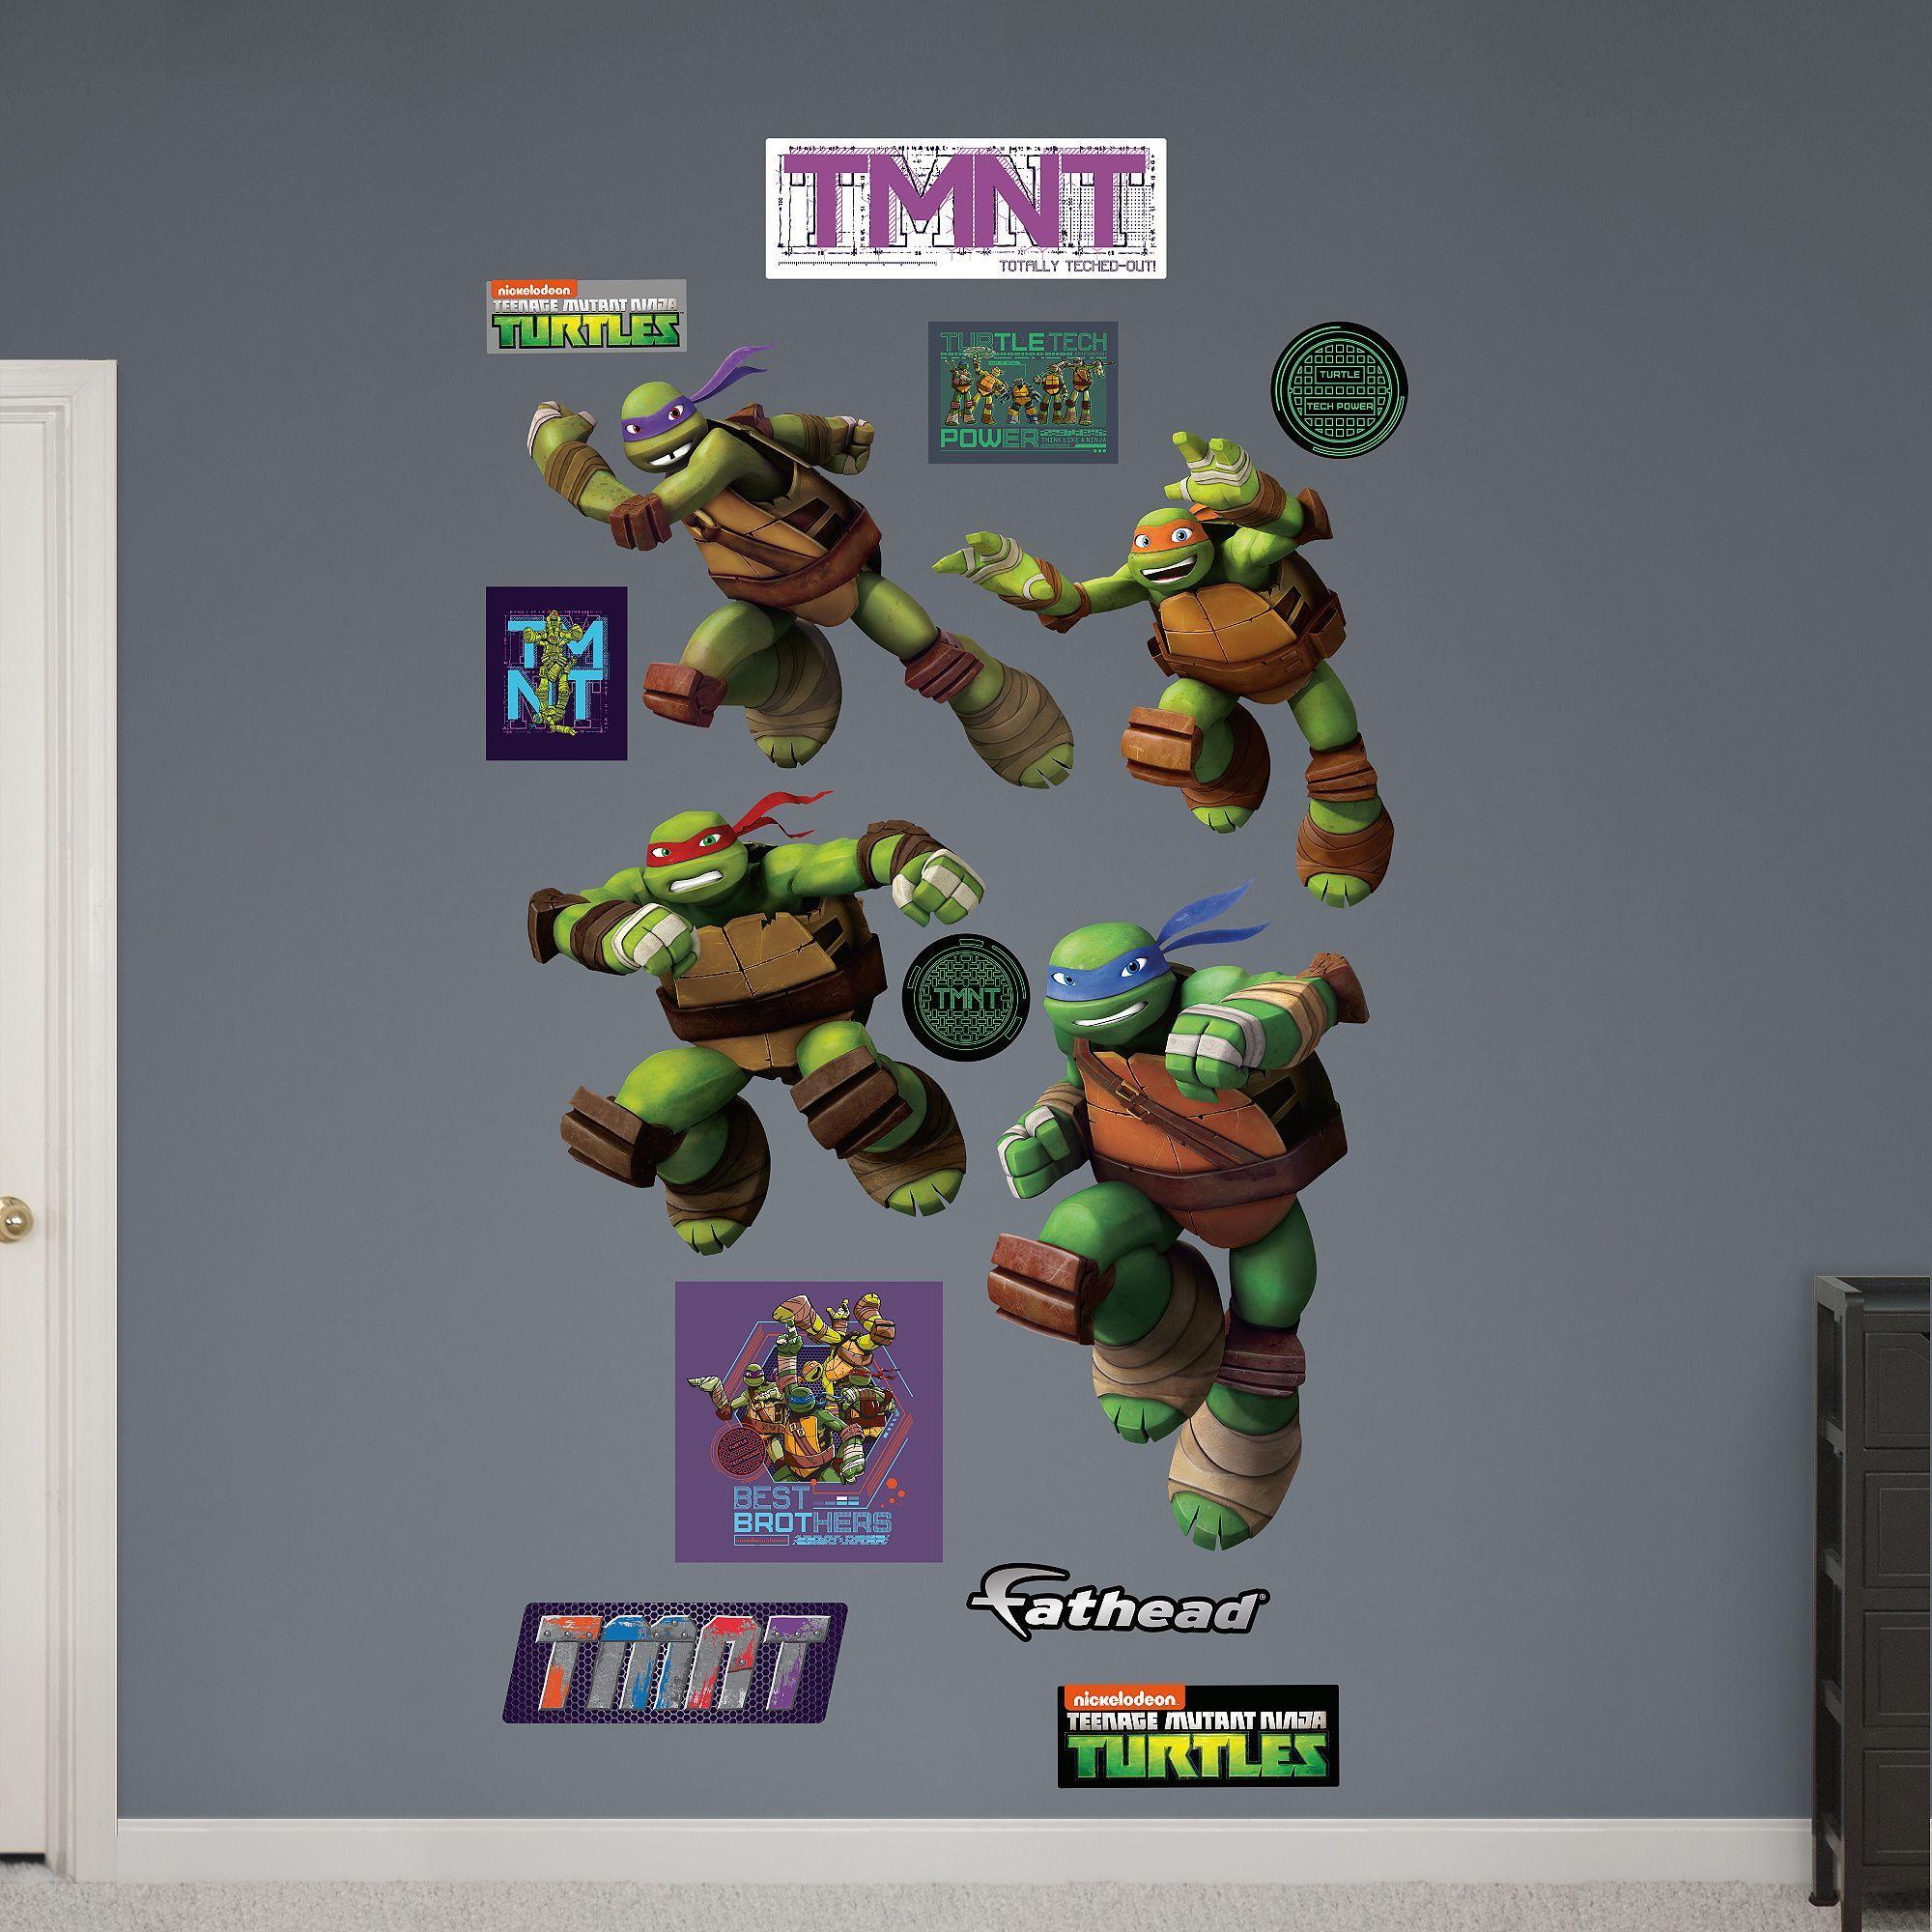 Fathead teenage mutant ninja turtles turtle power wall decals